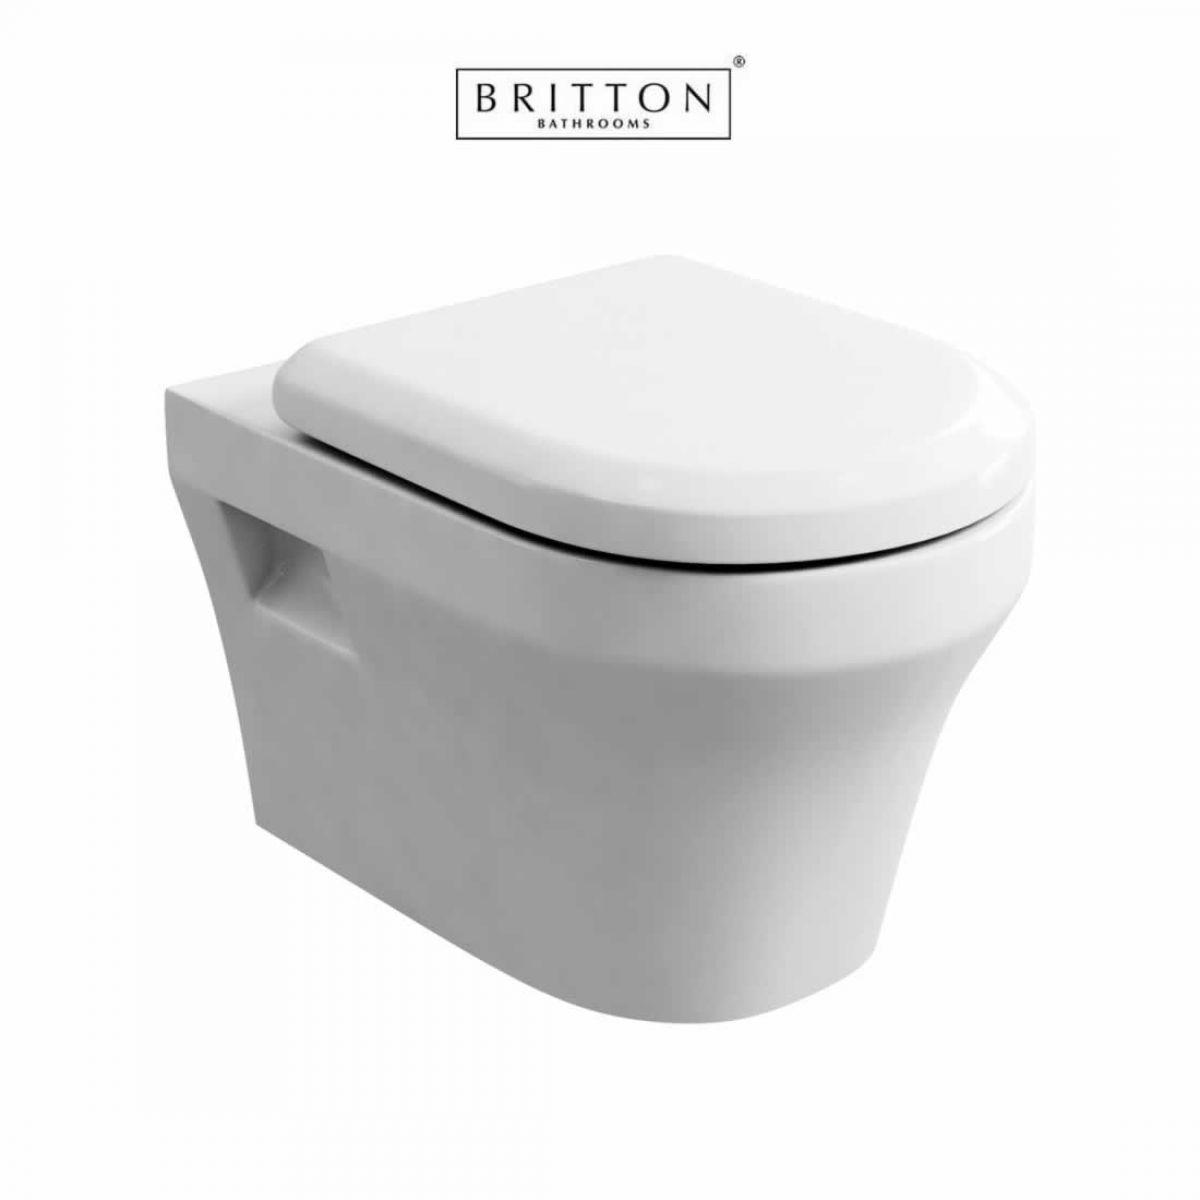 Britton Bathrooms Fine Wall Hung Toilet Uk Bathrooms